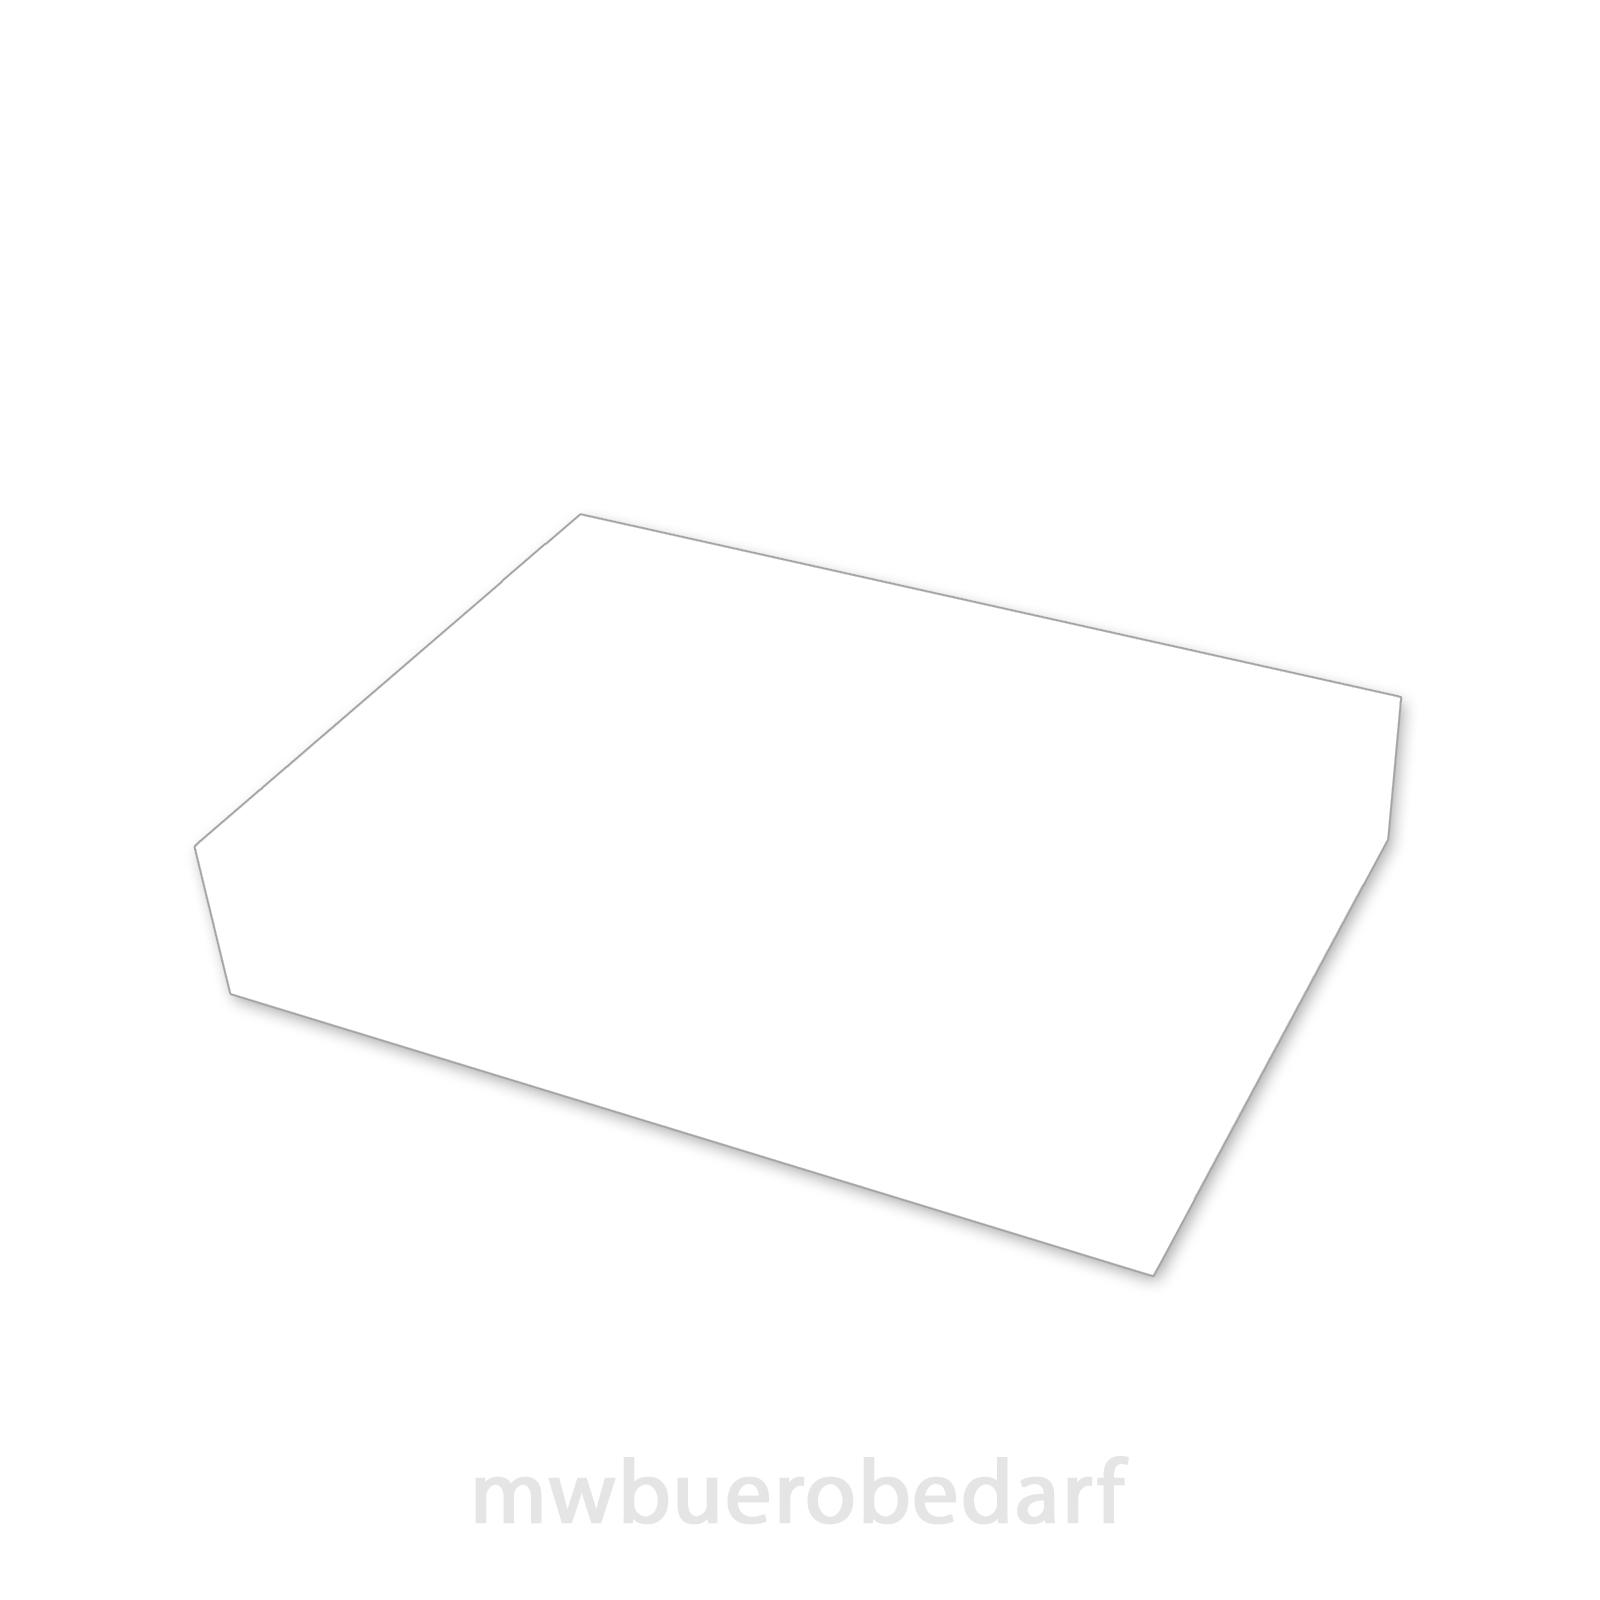 kopierpapier papier druckerpapier 500 blatt 80g farbig. Black Bedroom Furniture Sets. Home Design Ideas